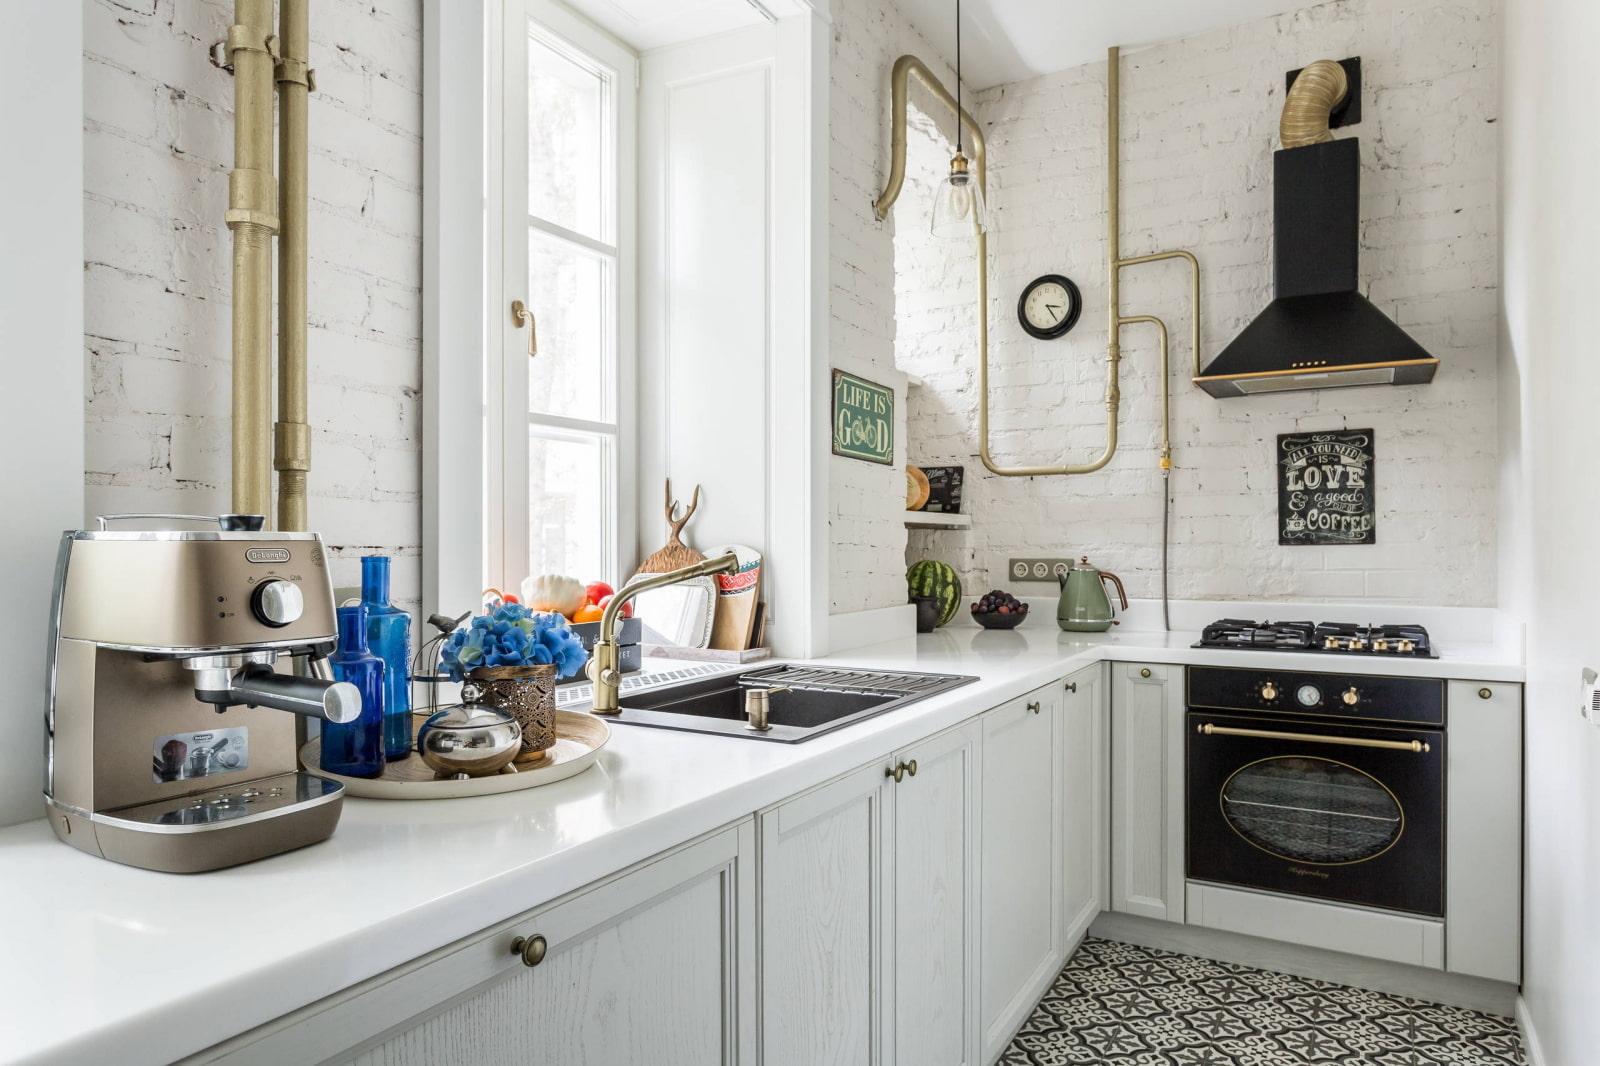 кухонный гарнитур с раковиной